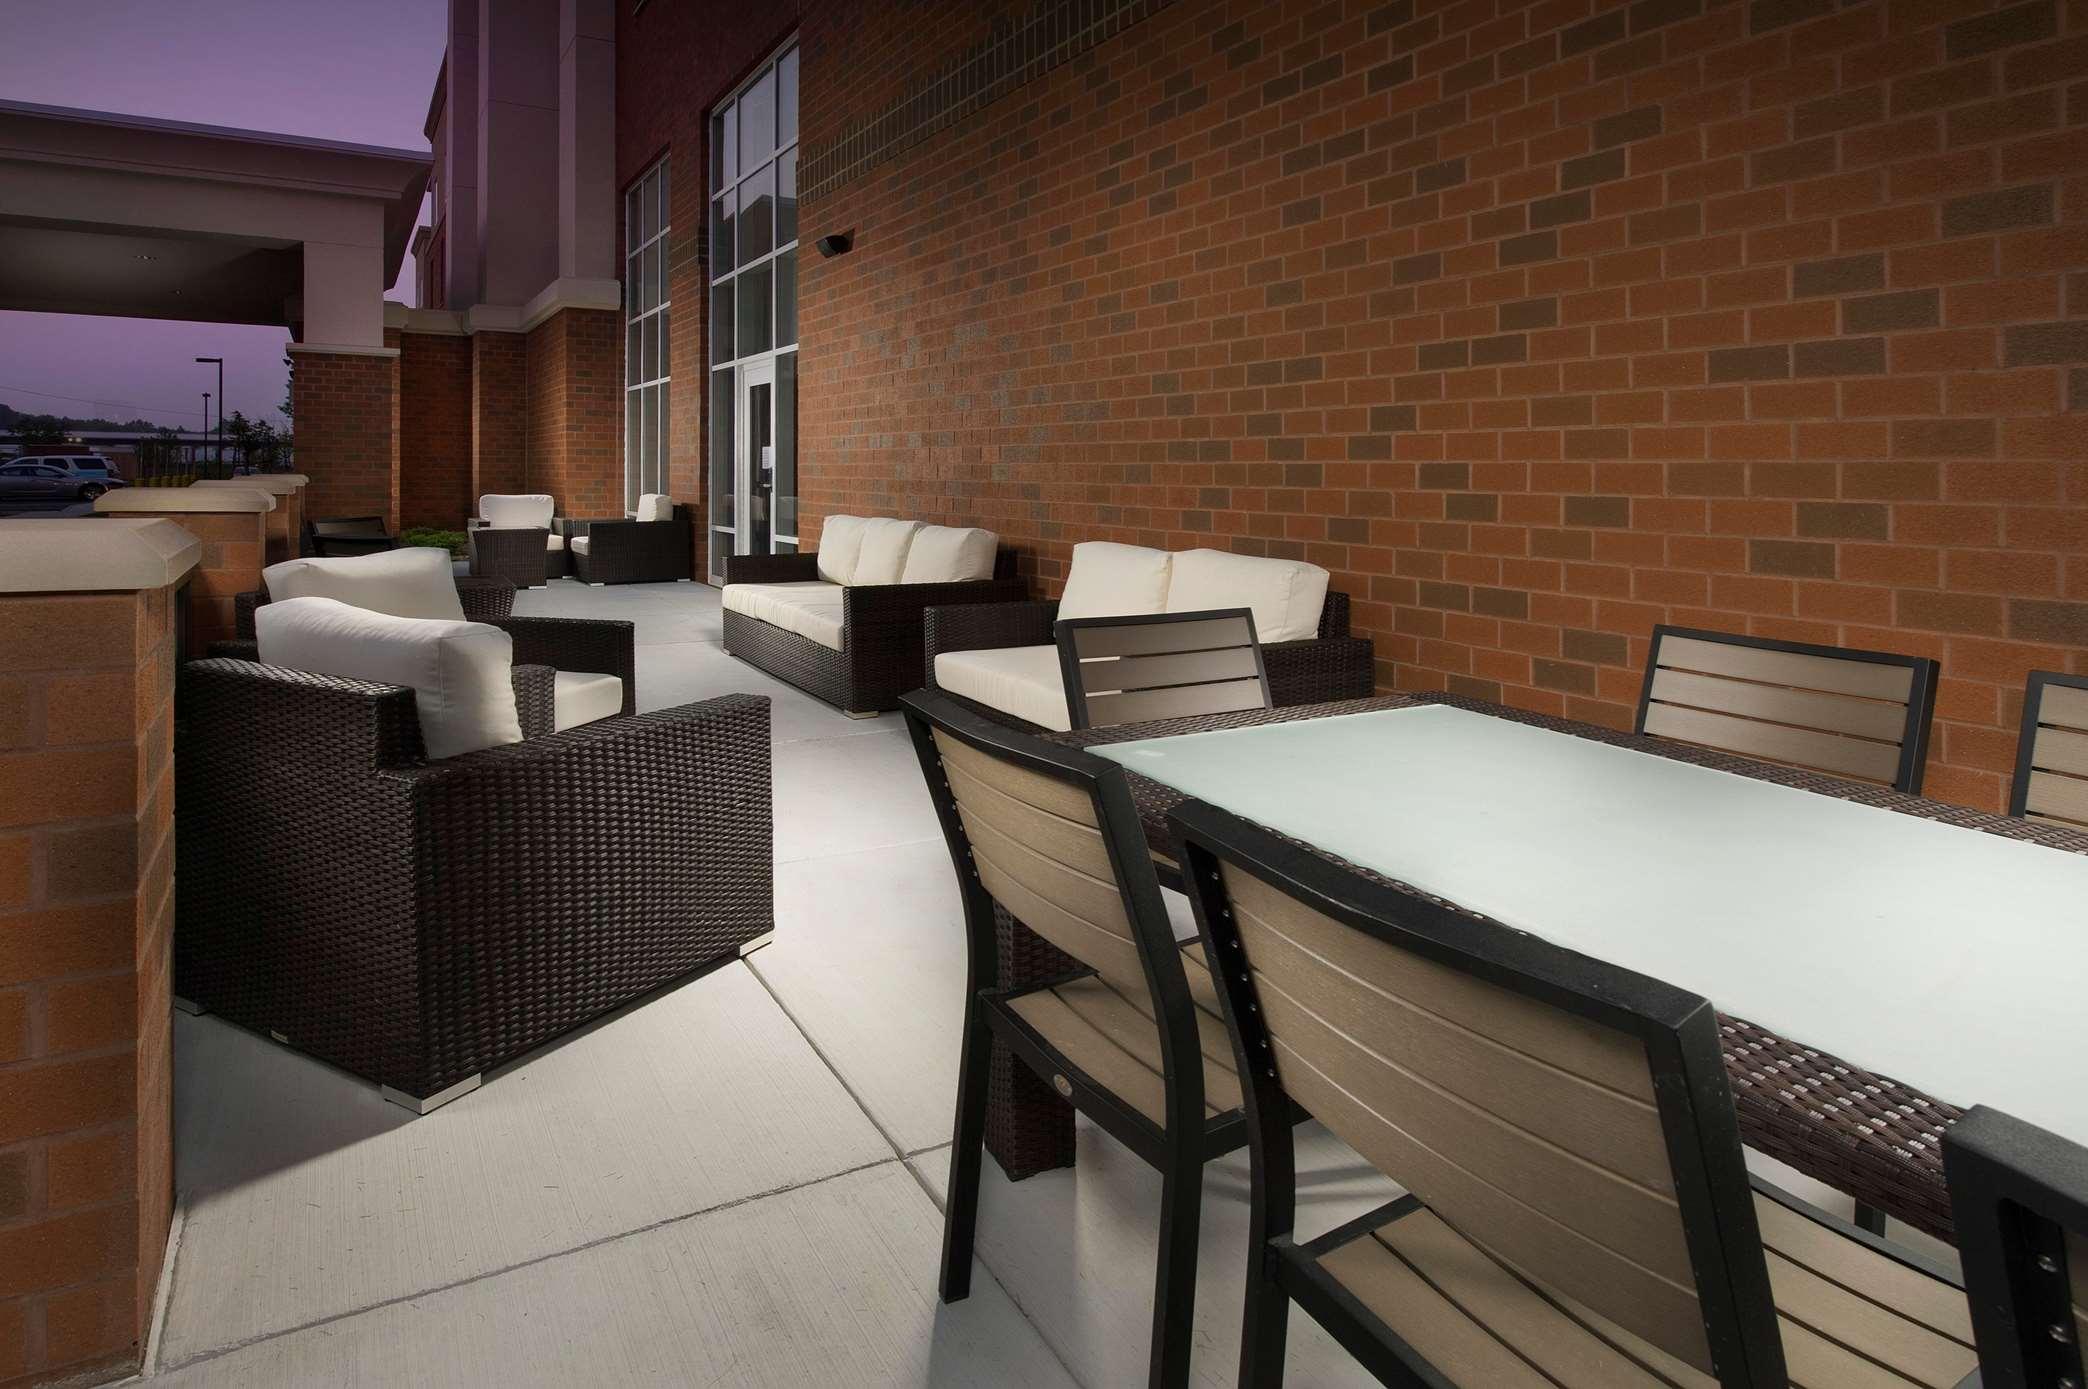 Hampton Inn & Suites Syracuse/Carrier Circle image 17